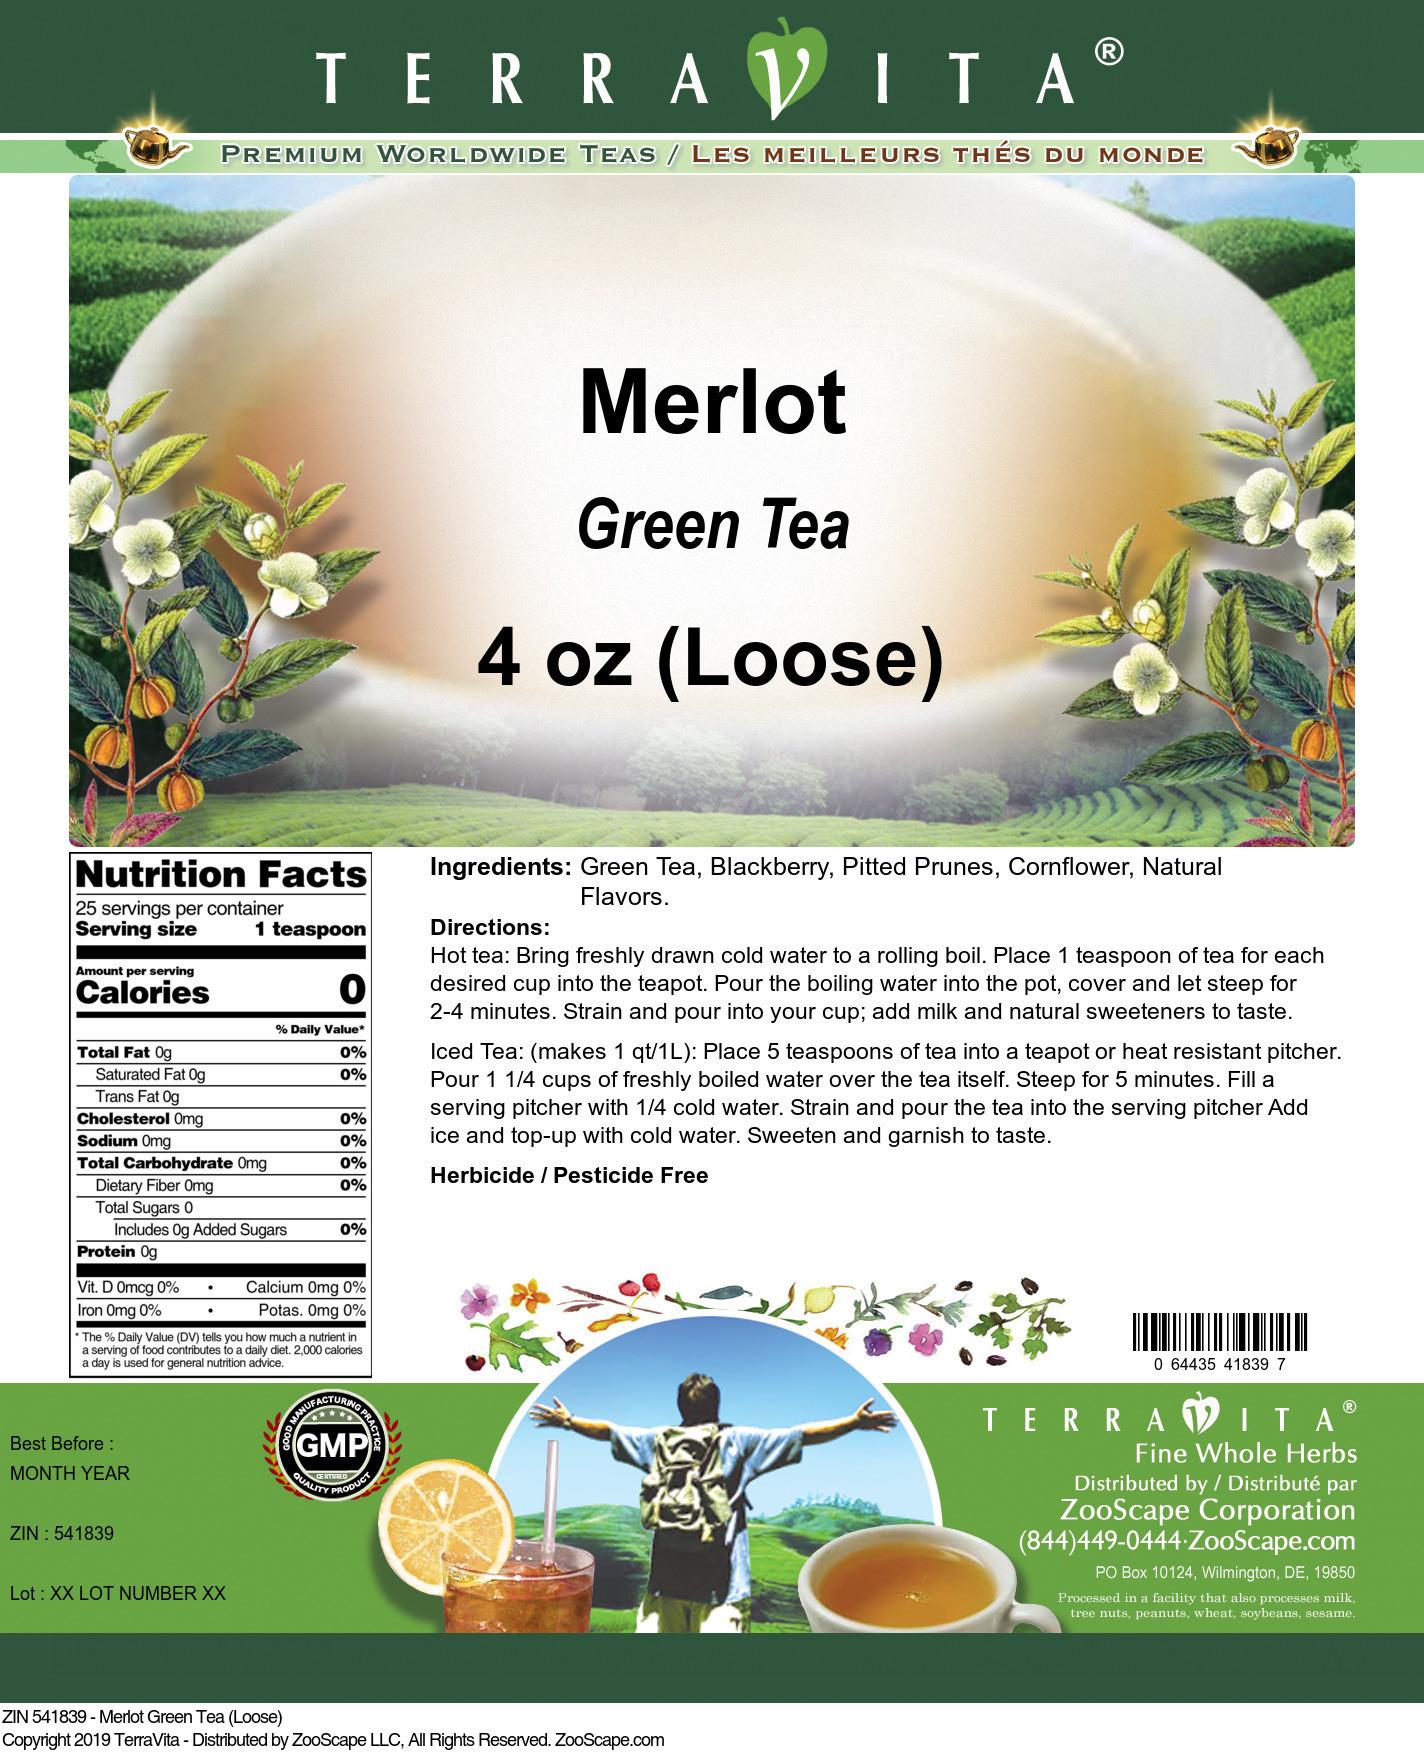 Merlot Green Tea (Loose)